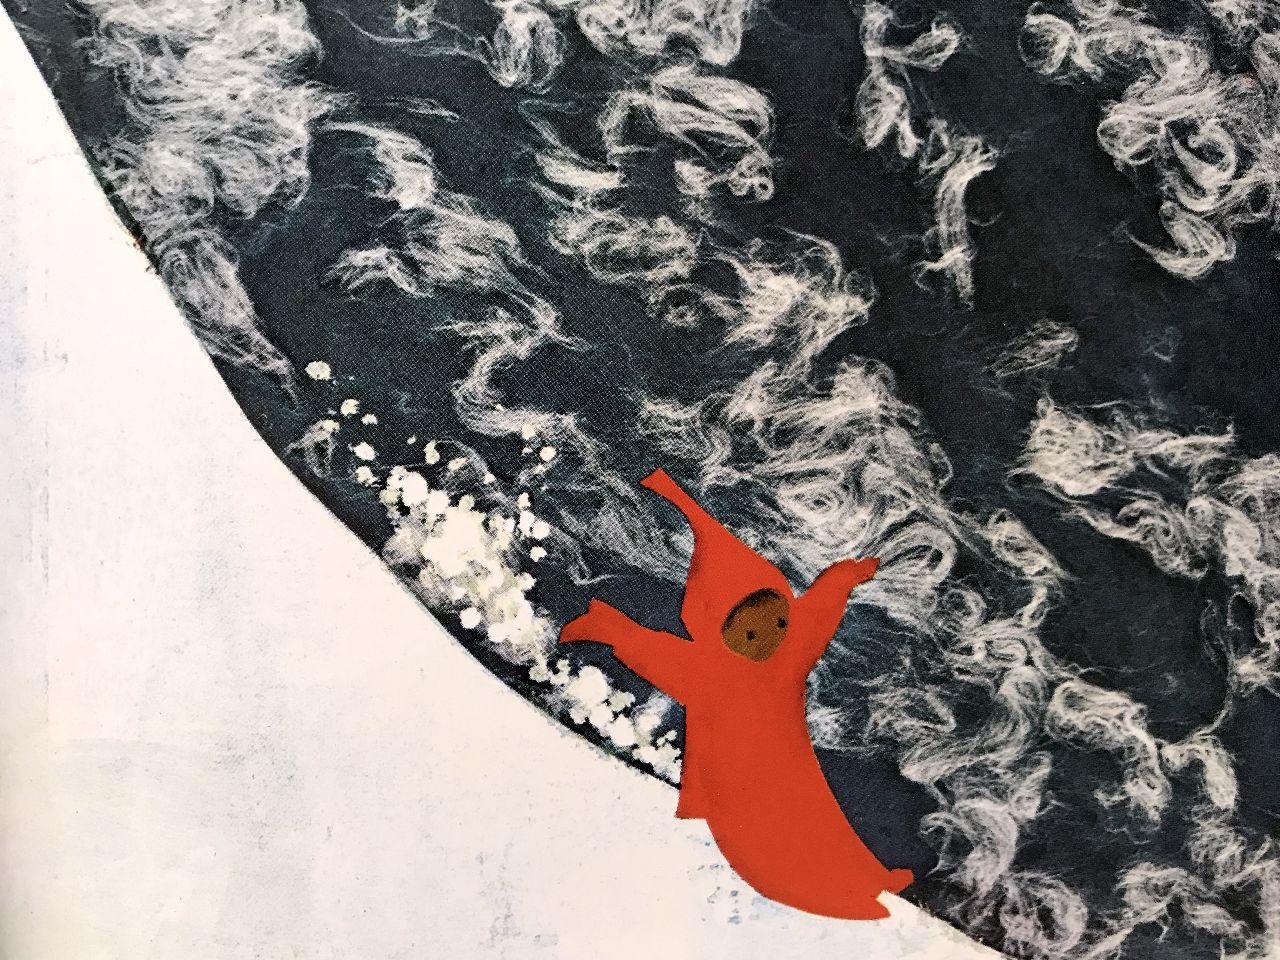 Ezra Jack Keats, Peter nella neve, Terredimezzo